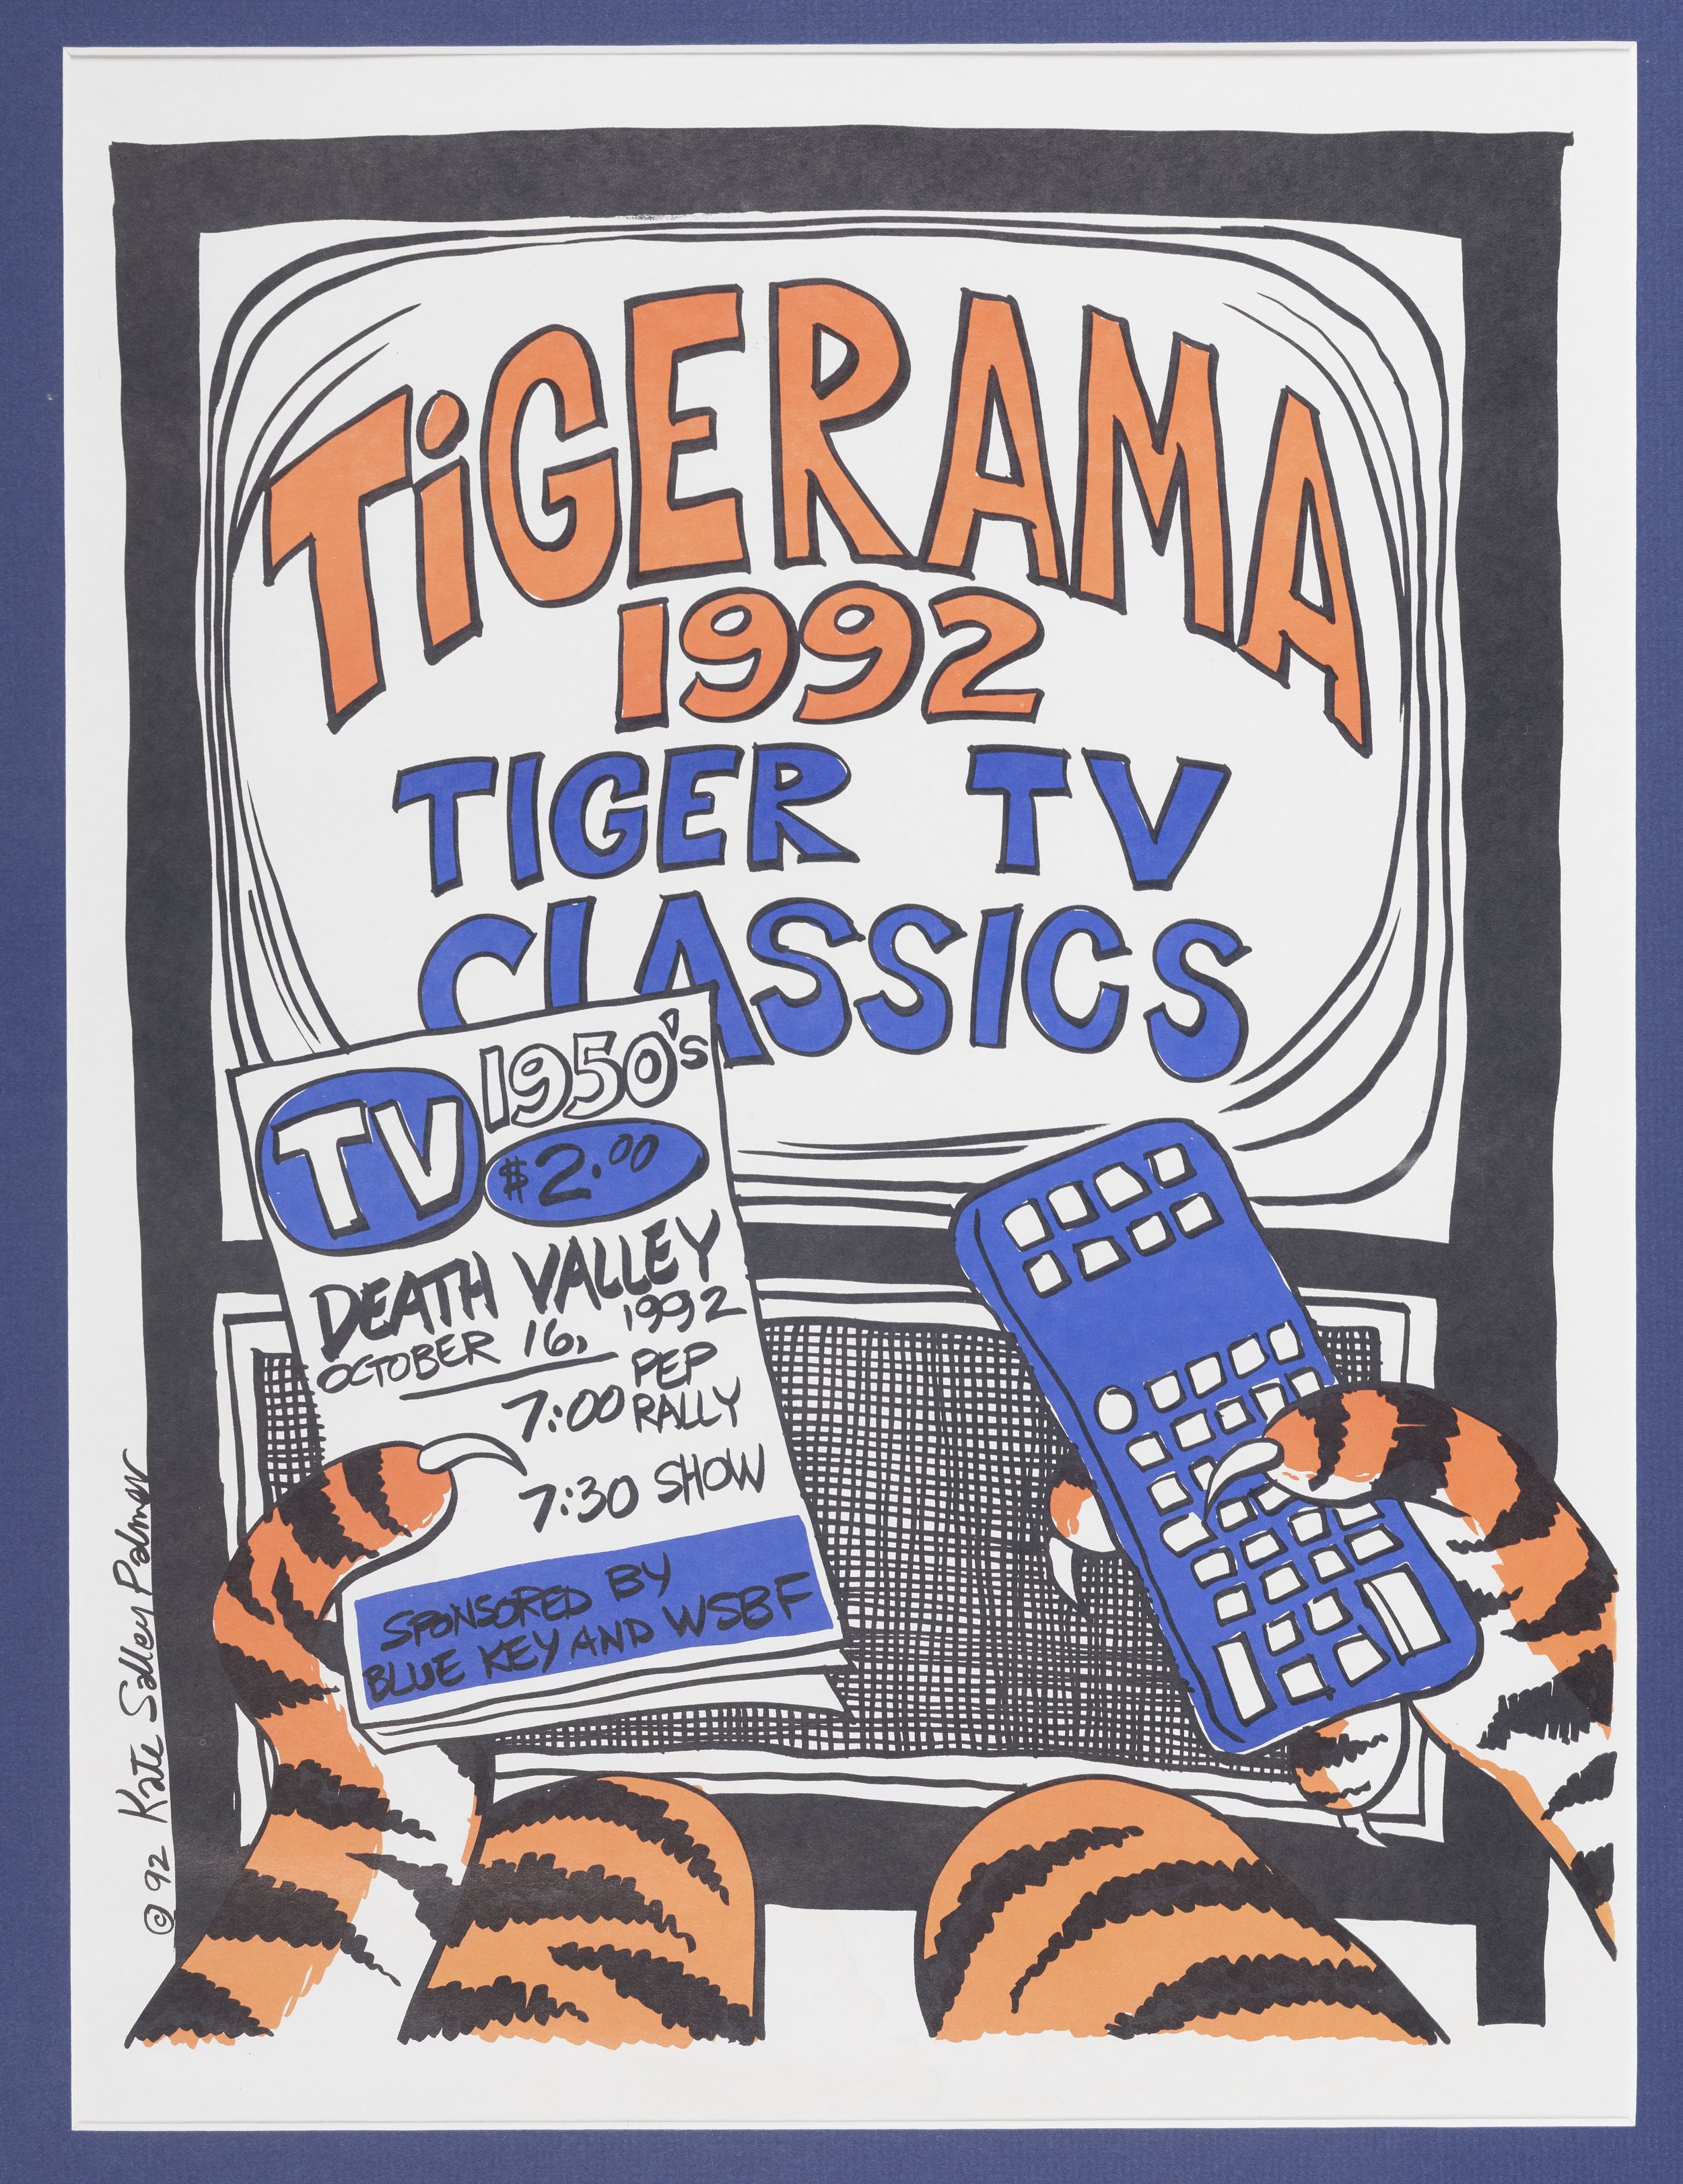 Tigerama 1992